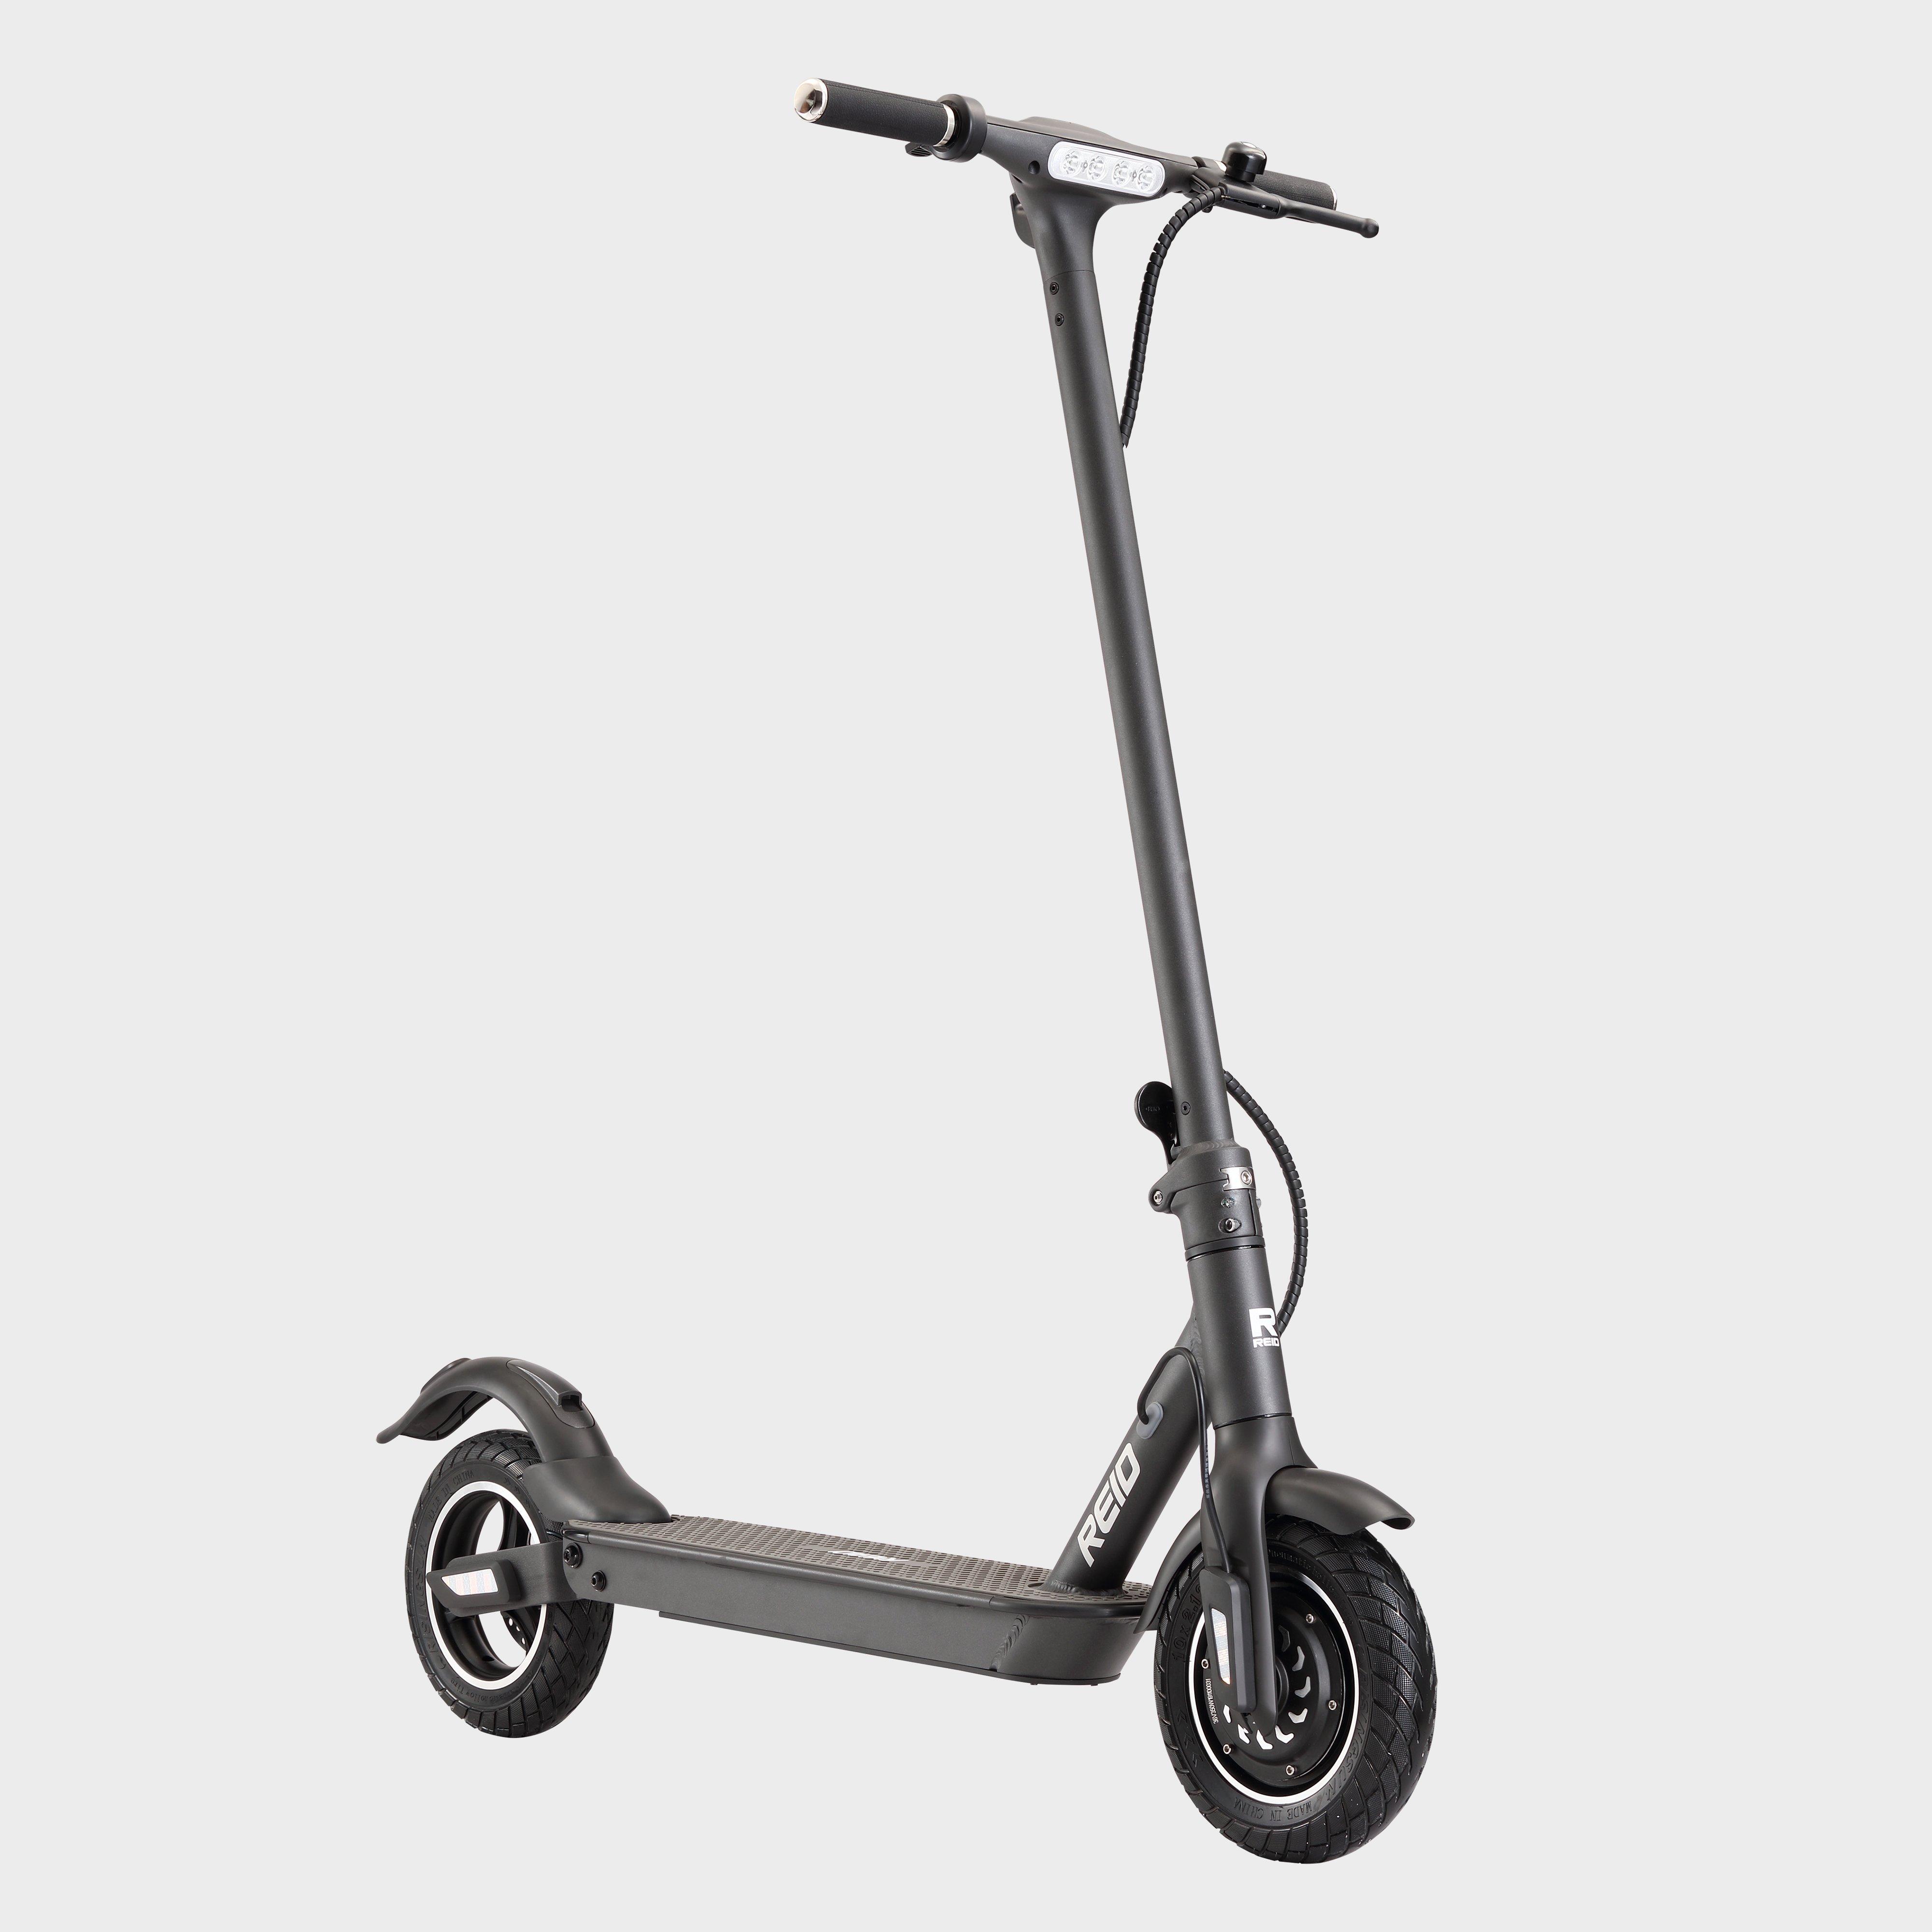 Reid E4 Electric Scooter - Black, Black